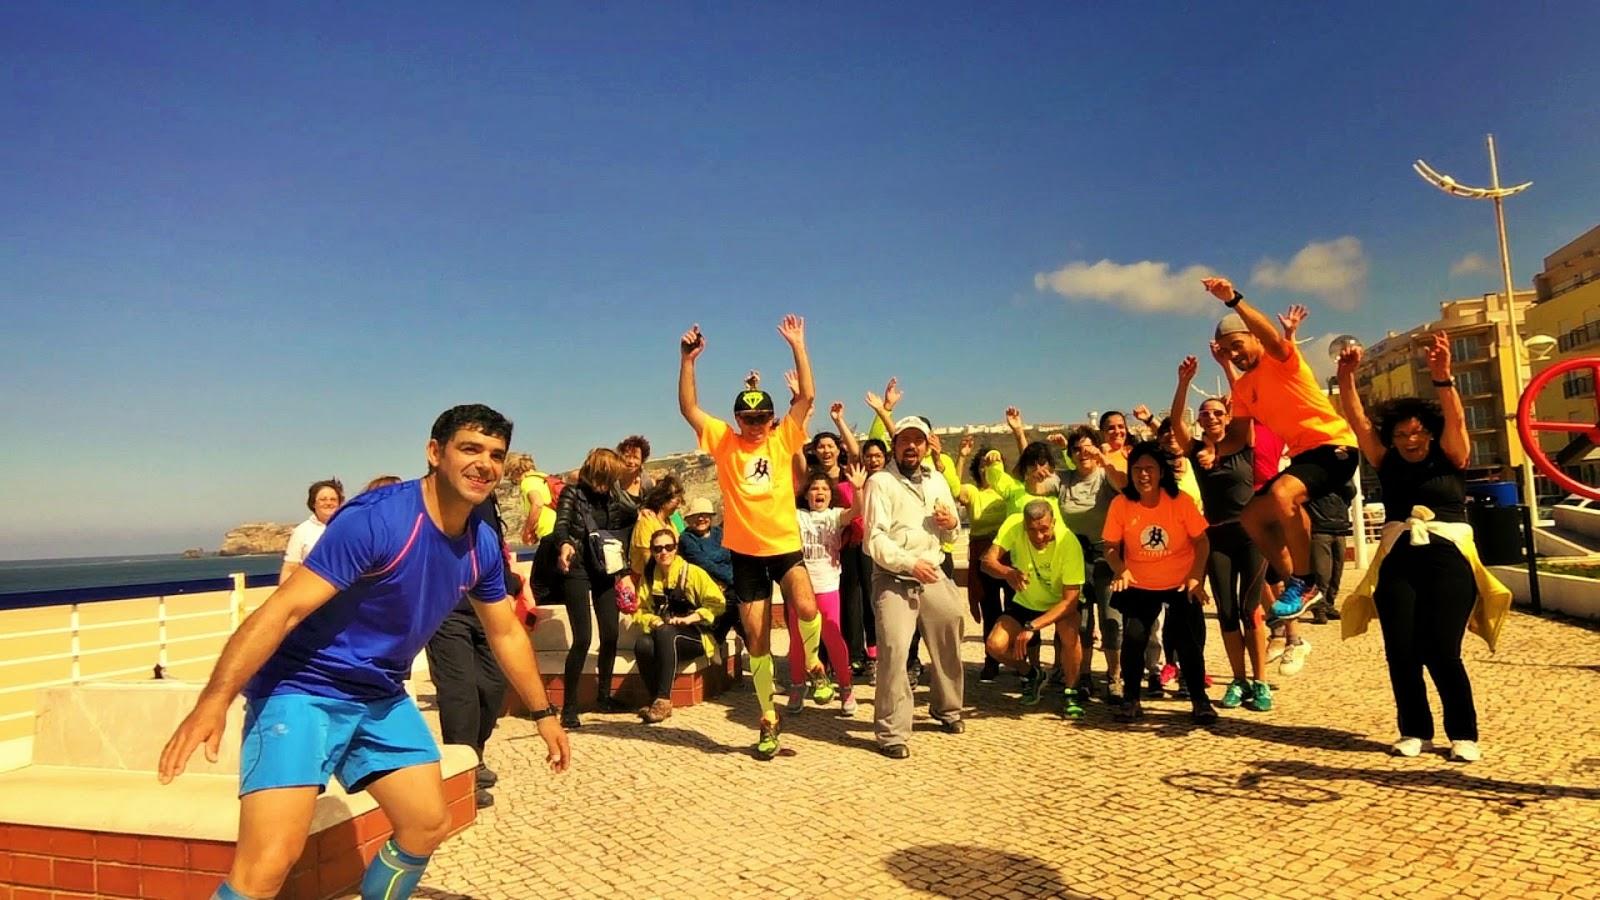 Dia Mundial da Actividade Física e Saúde - Nazaré - Portugal